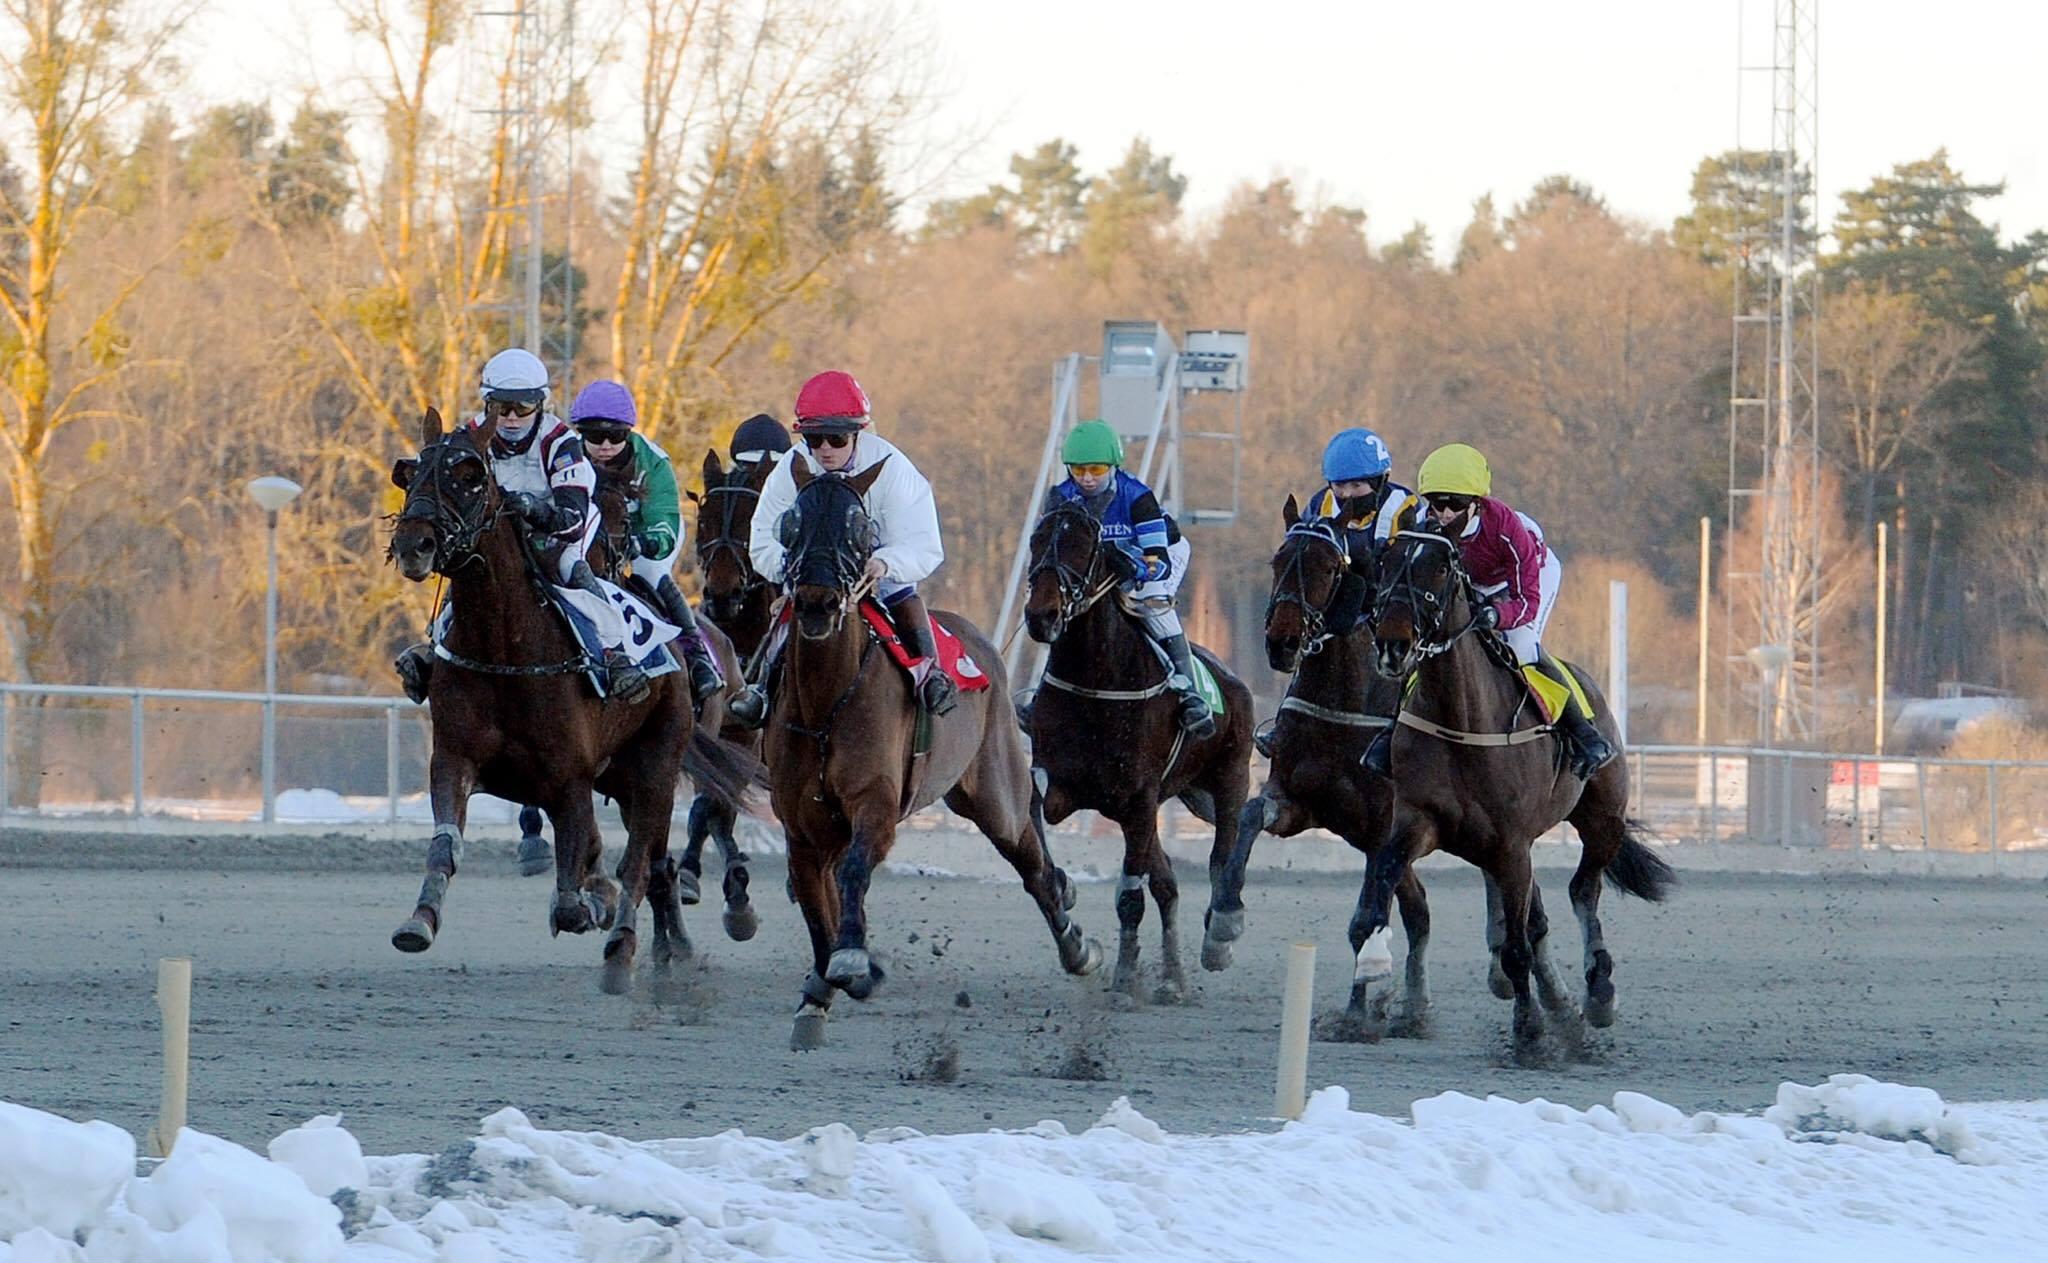 Winter monté racing in Sweden. Monté is the European name for RUS.